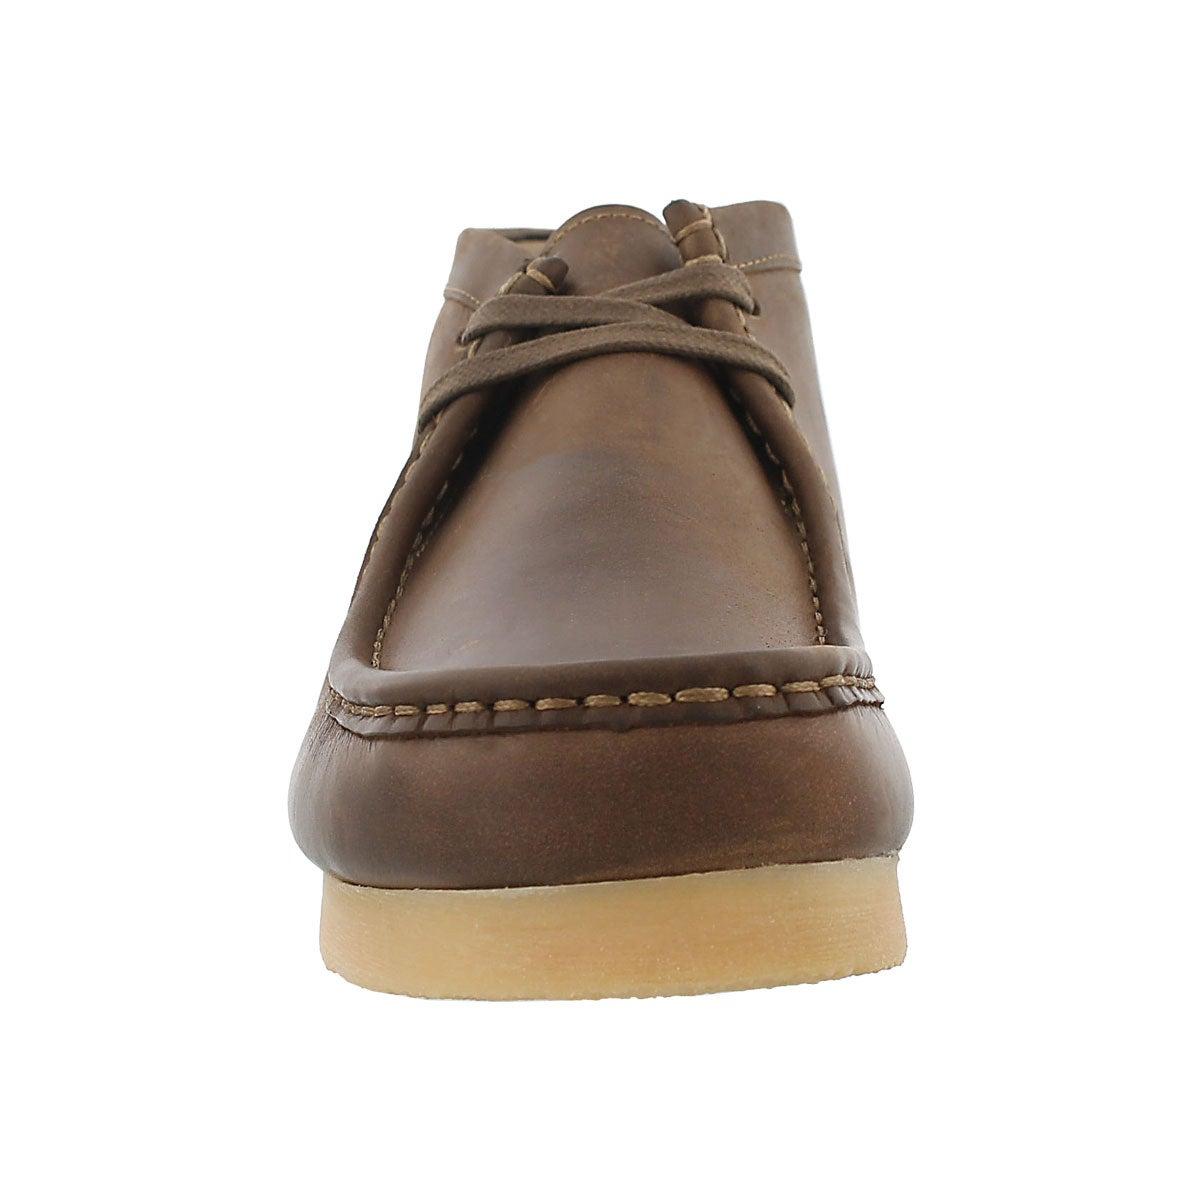 Mns Stinson Hi beeswax casual shoe